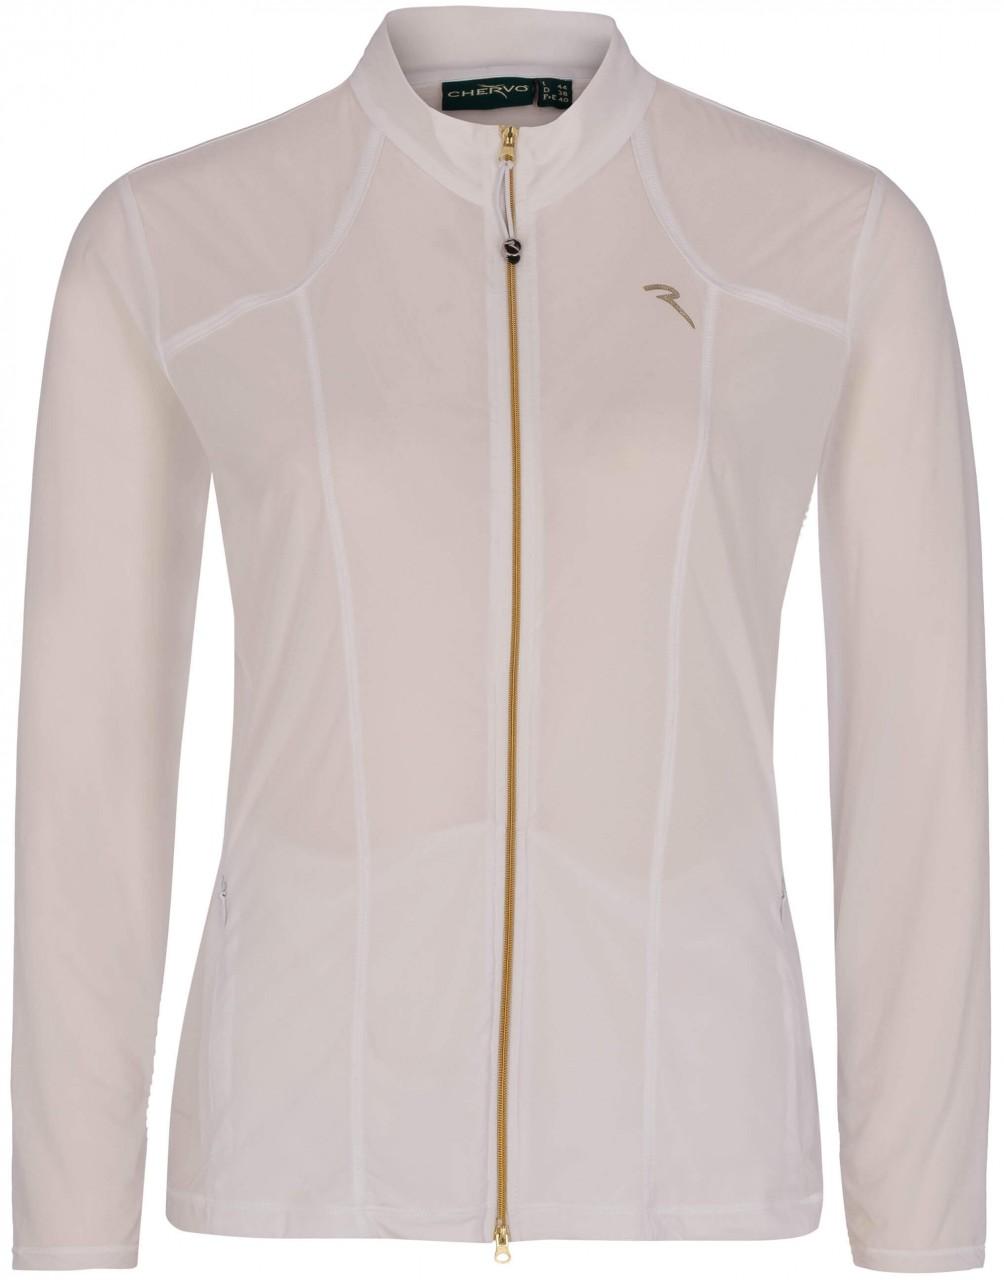 Chervo Page Sweater, white